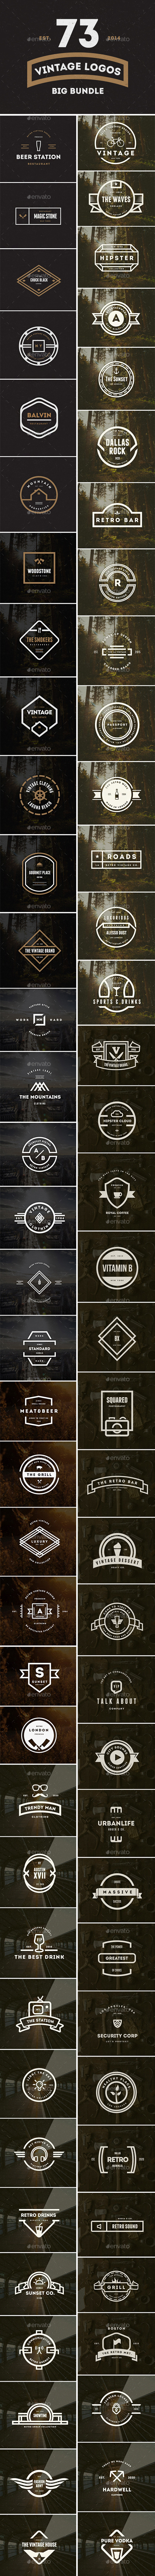 73 Vintage Labels & Badges Logos Bundle - Badges & Stickers Web Elements